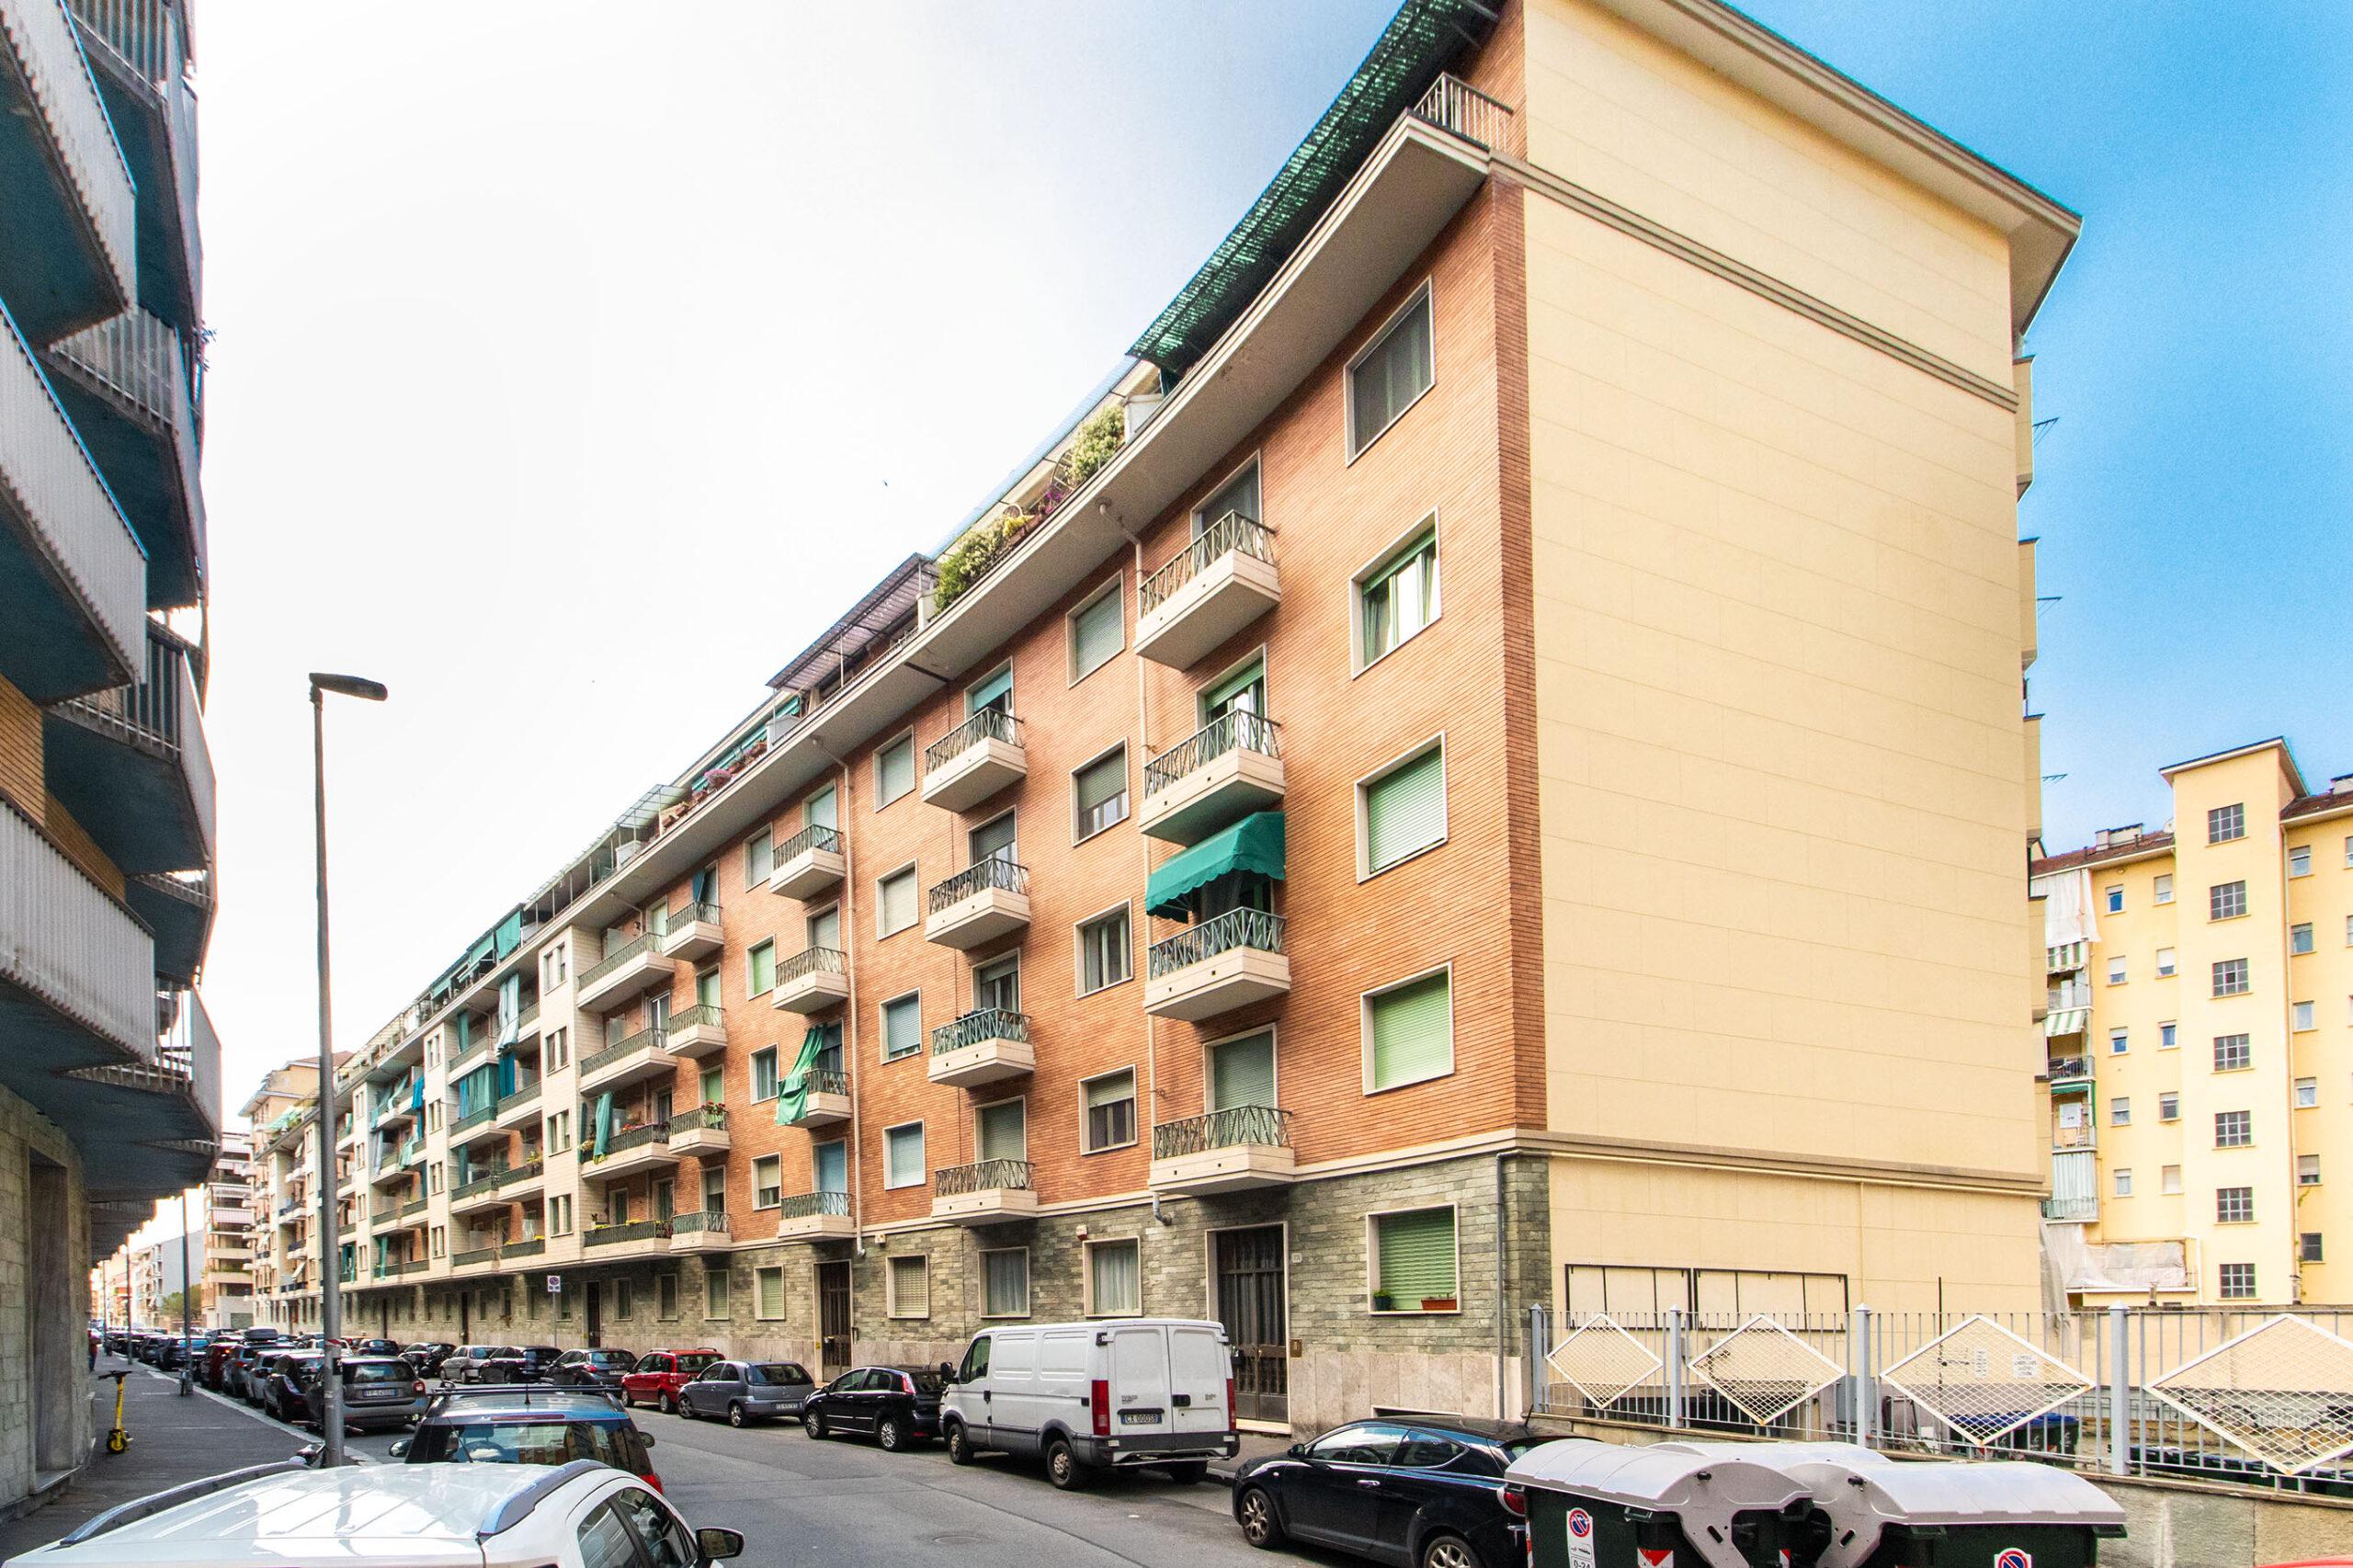 Magazzino: Via Oslavia, 75, Vanchiglietta, Torino